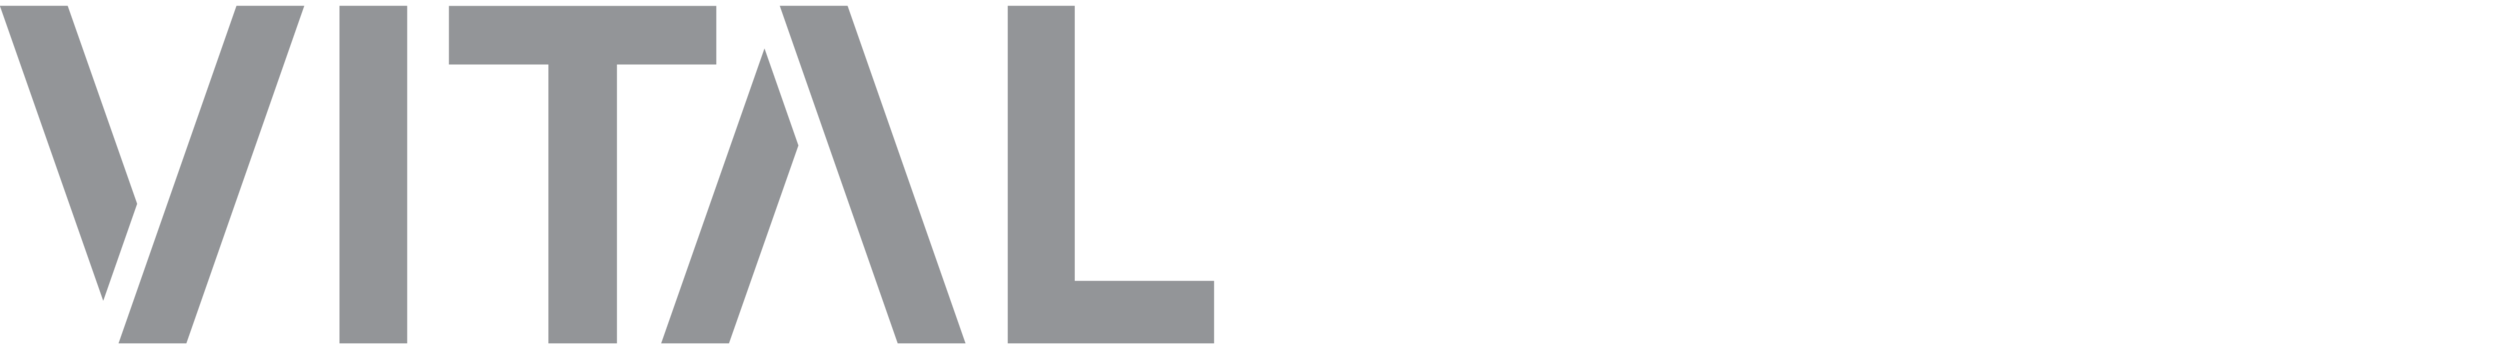 VITALYOGA.png